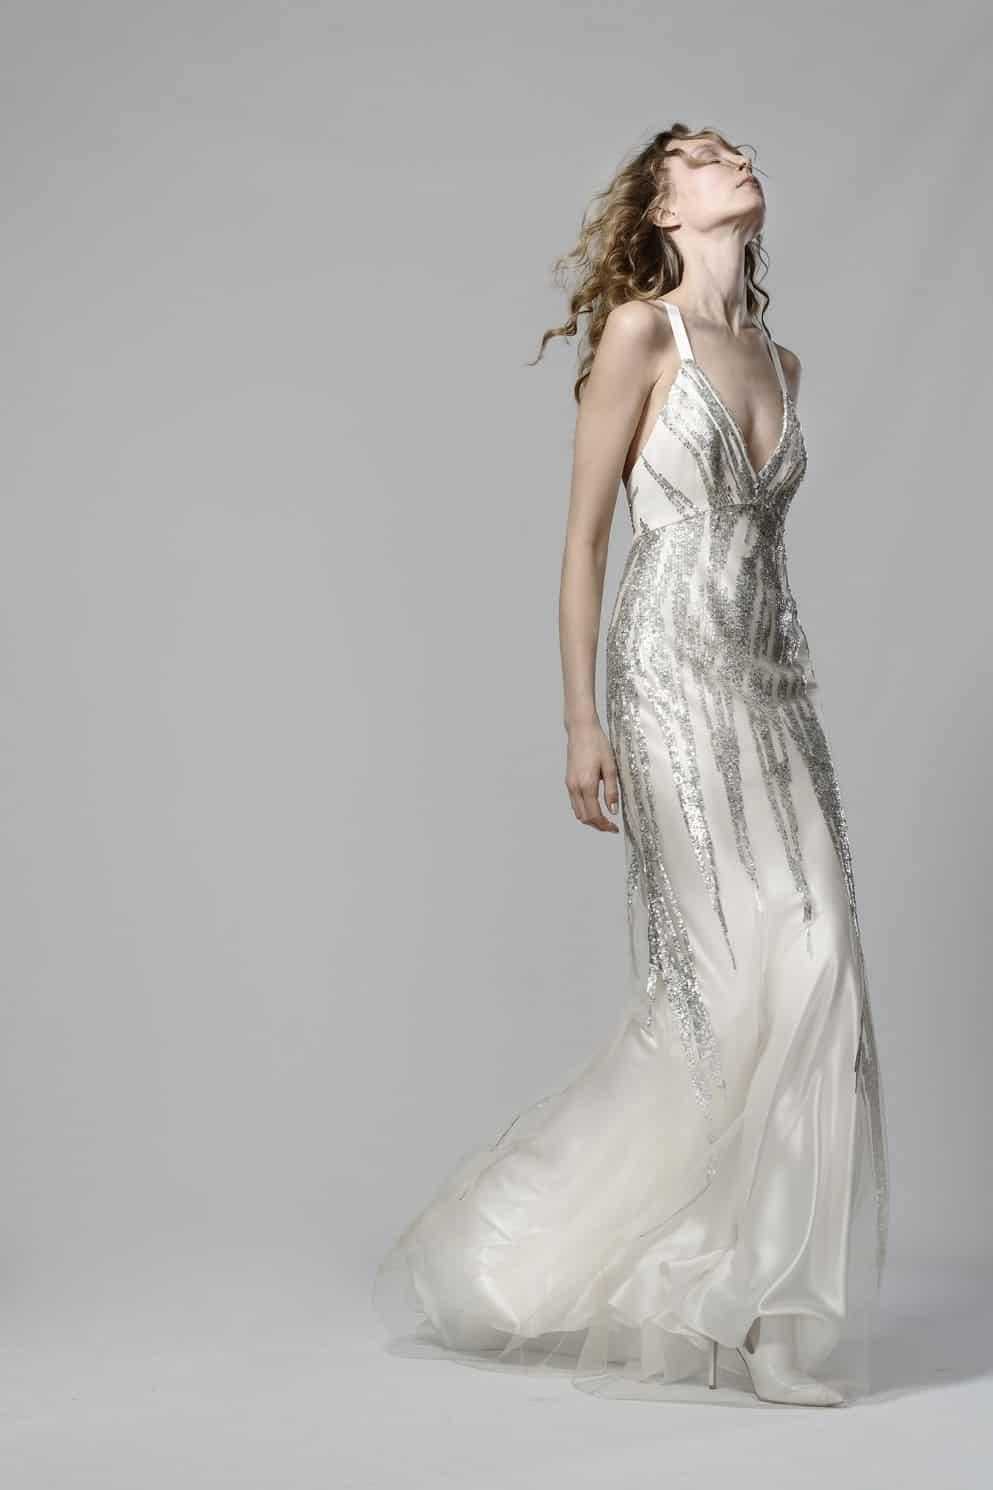 metalico-elizabeth-fillmore-wedding-dresses-spring-2019-007